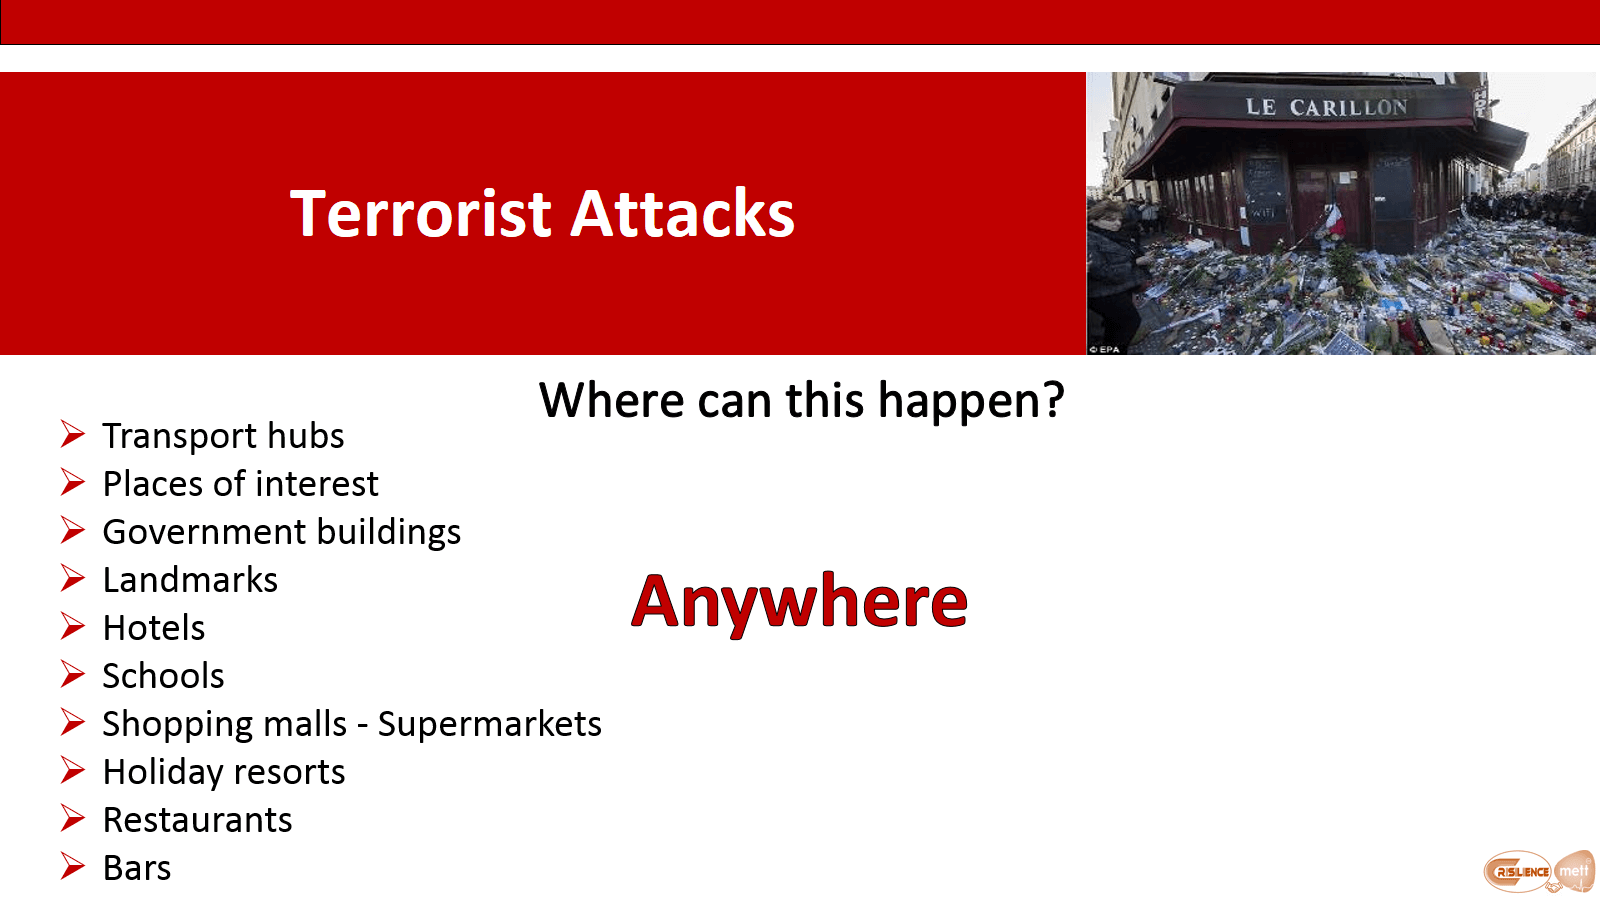 CIMAT slide 8 Terror attacks where can this happen?